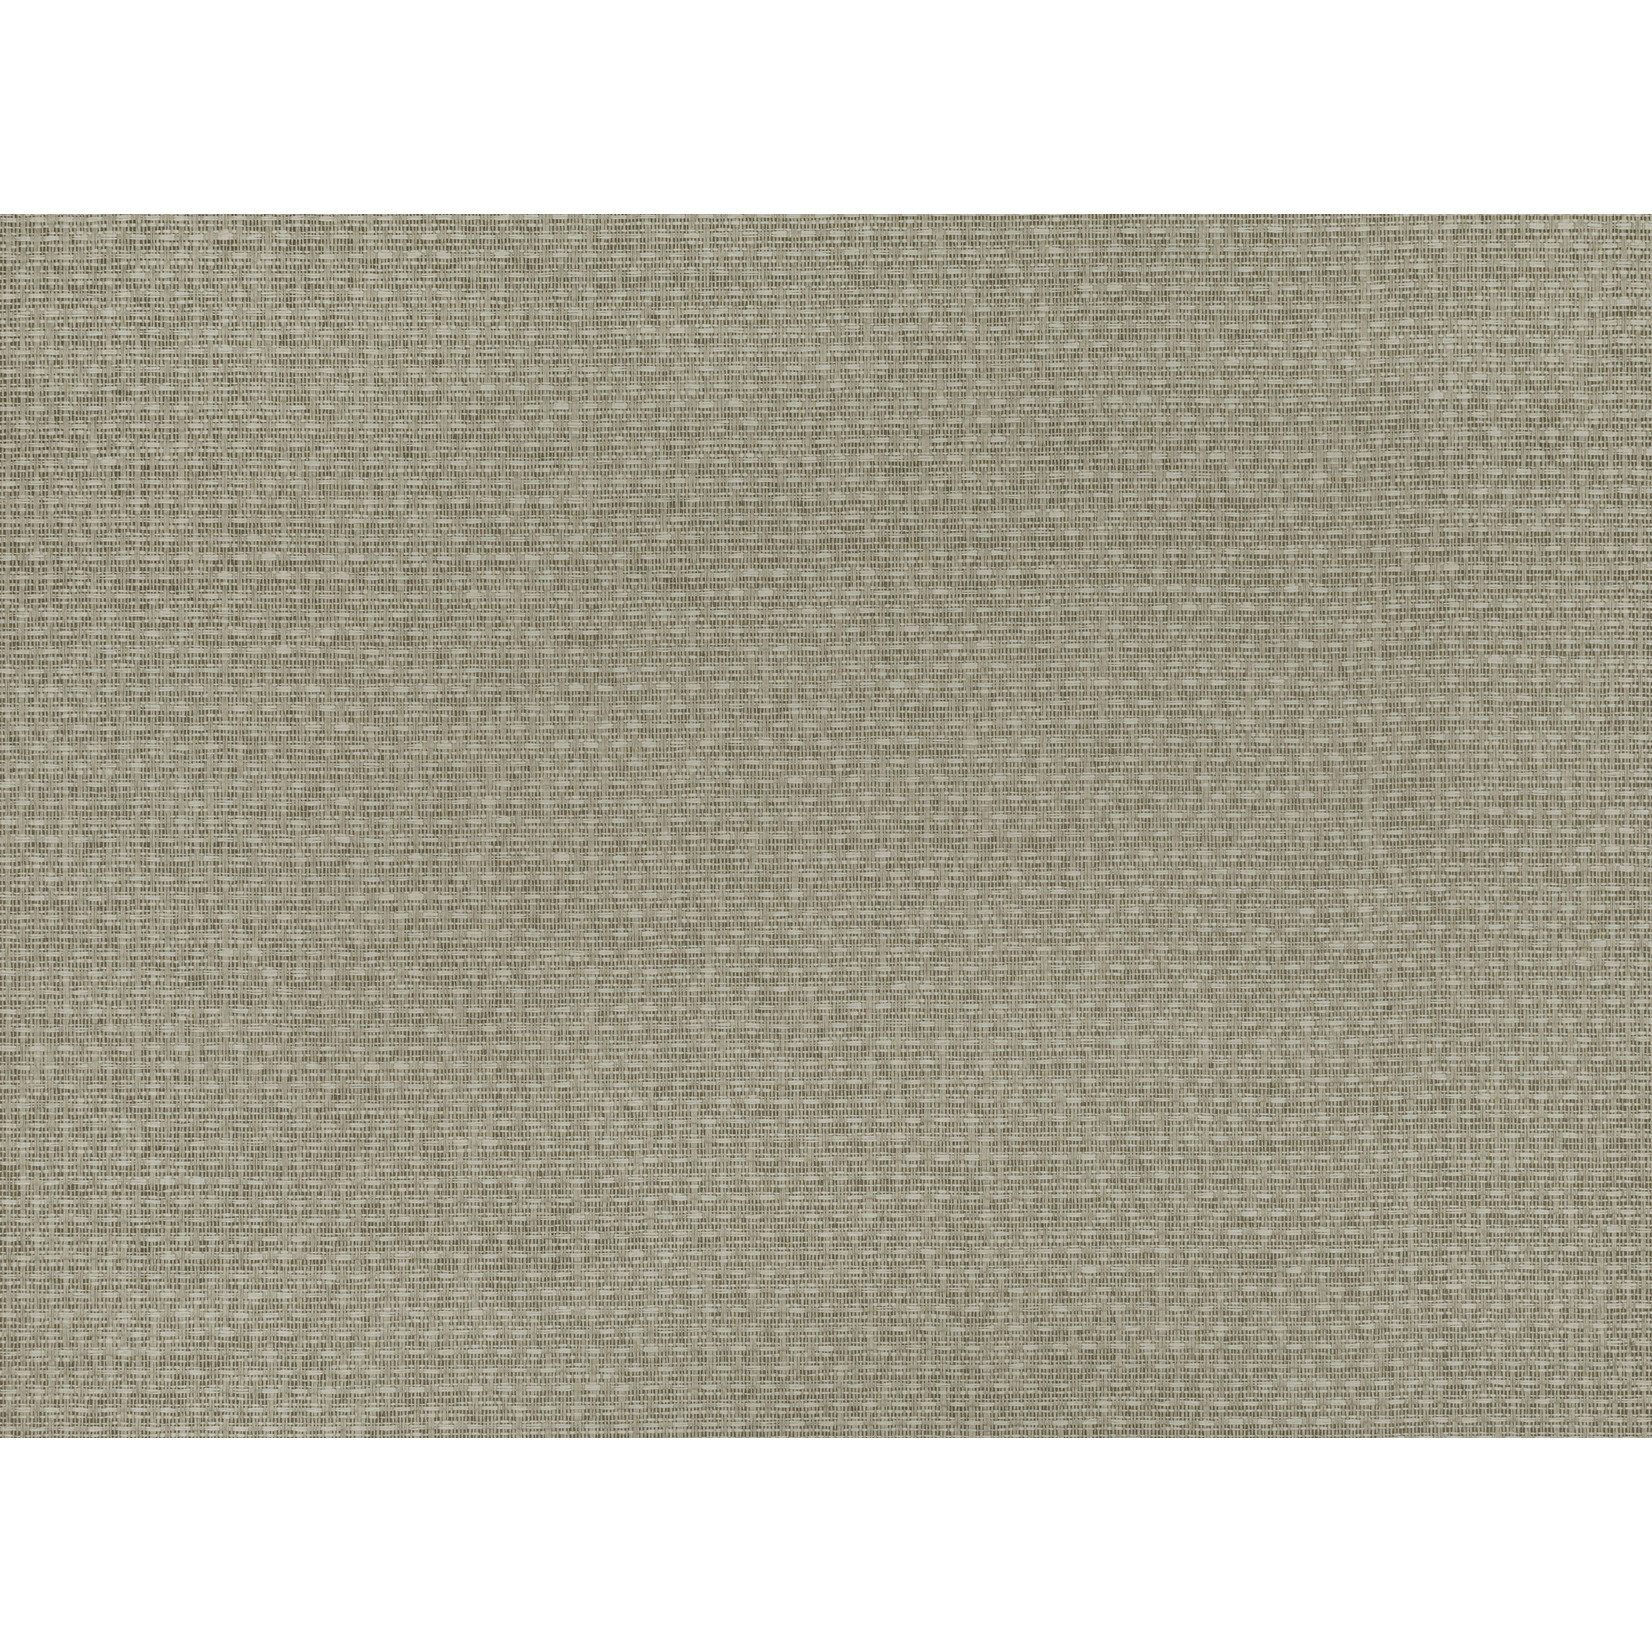 Mark Alexander Paperweave Handwoven Wallcoverings | Shifu Sea Mist